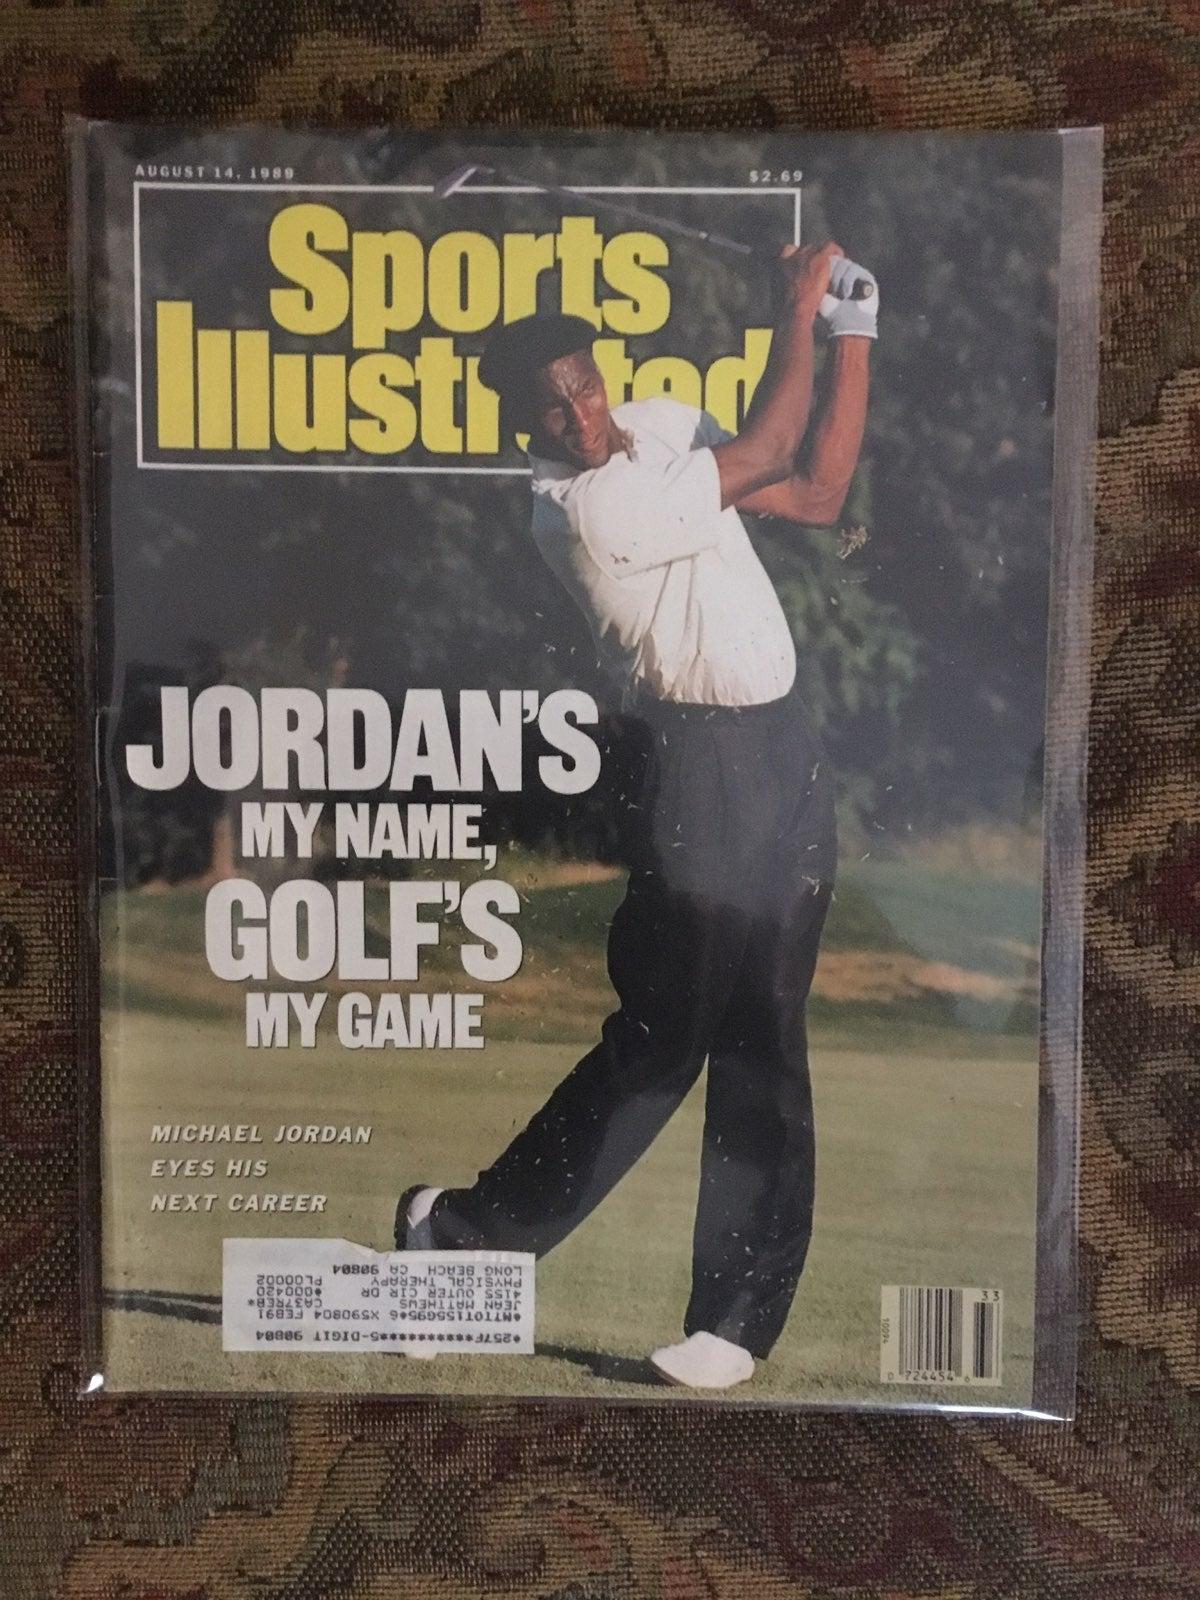 1989 Michael Jordan Sports Illustrated